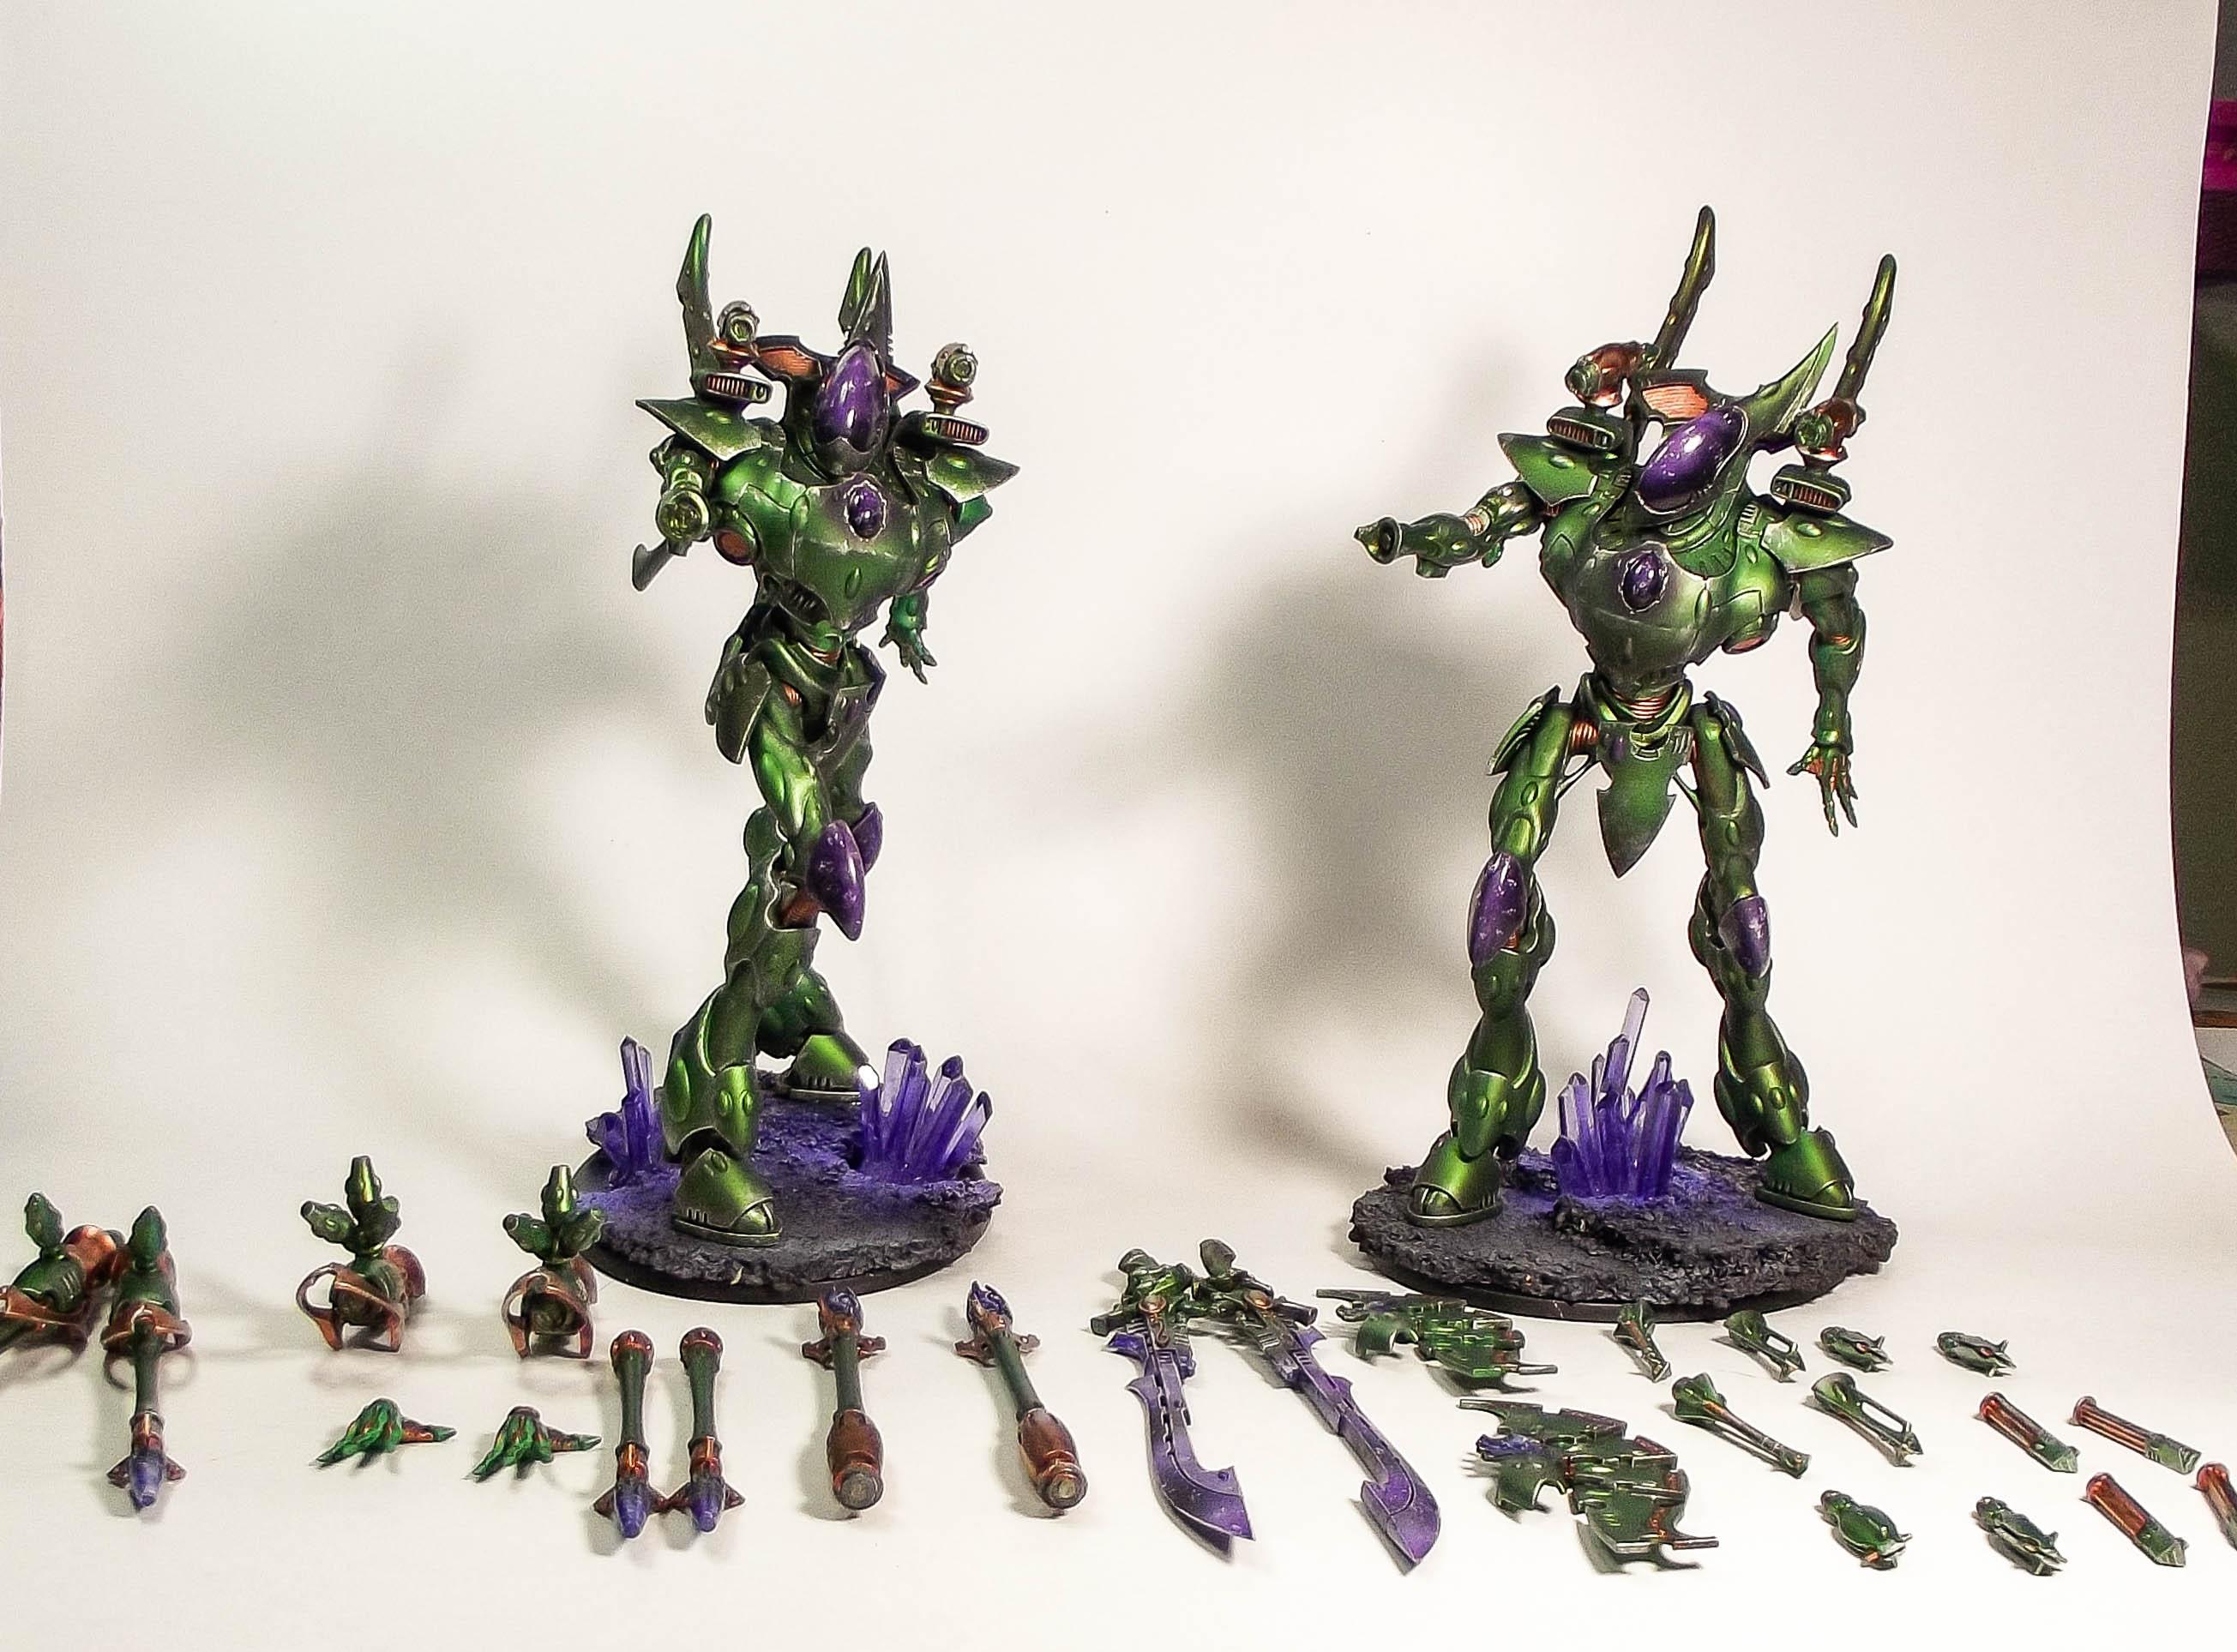 Crystal, Eldar, Green, Metallic, Purple, Warhammer 40,000, Wraithknight